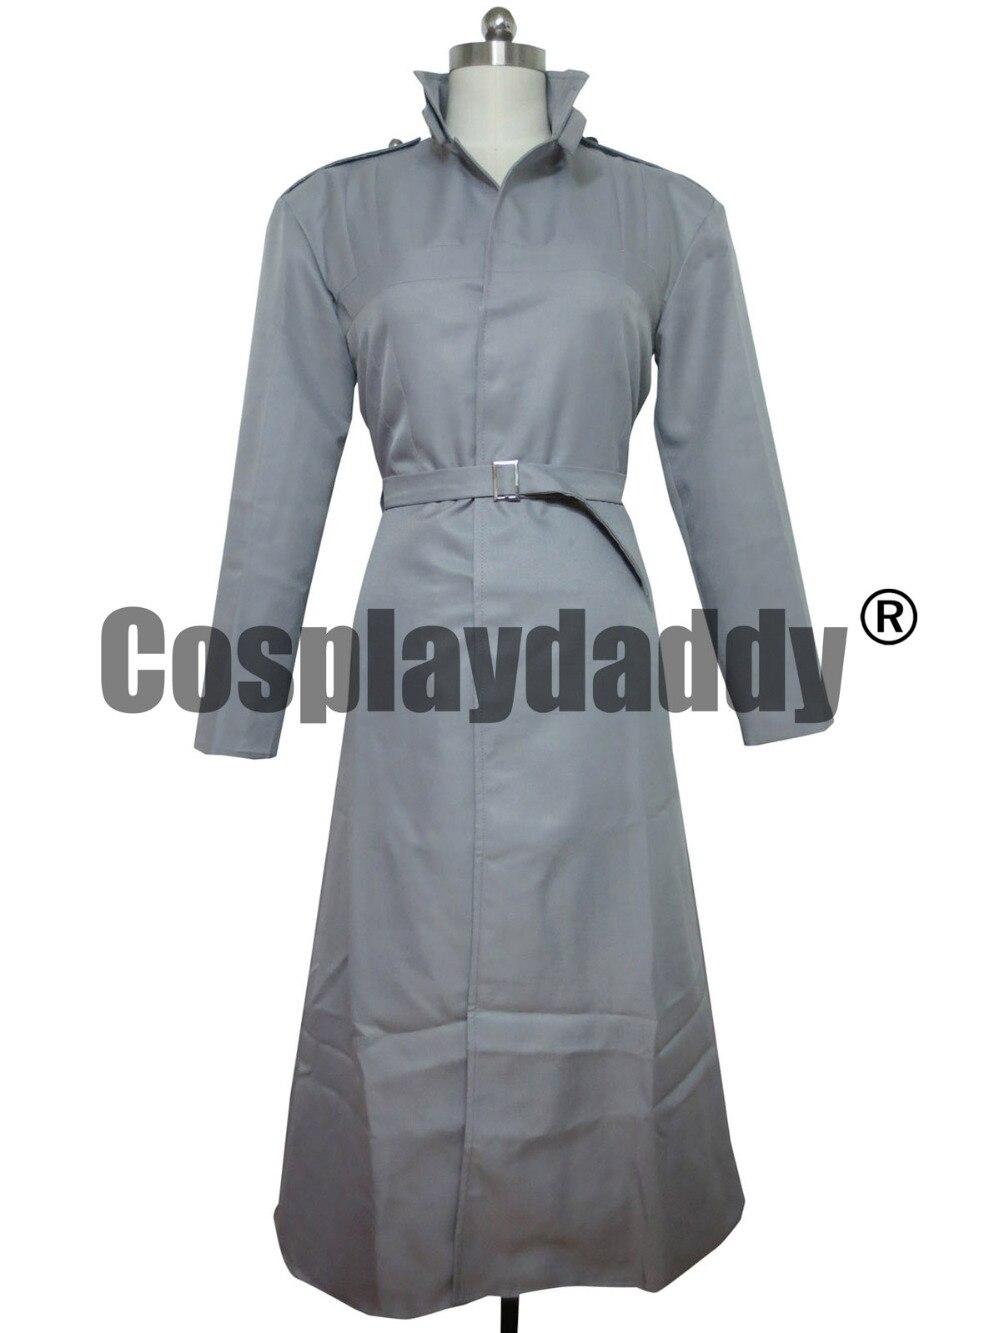 Tóquio ghoul kisho arima trincheira masculina longo casaco cosplay traje s002